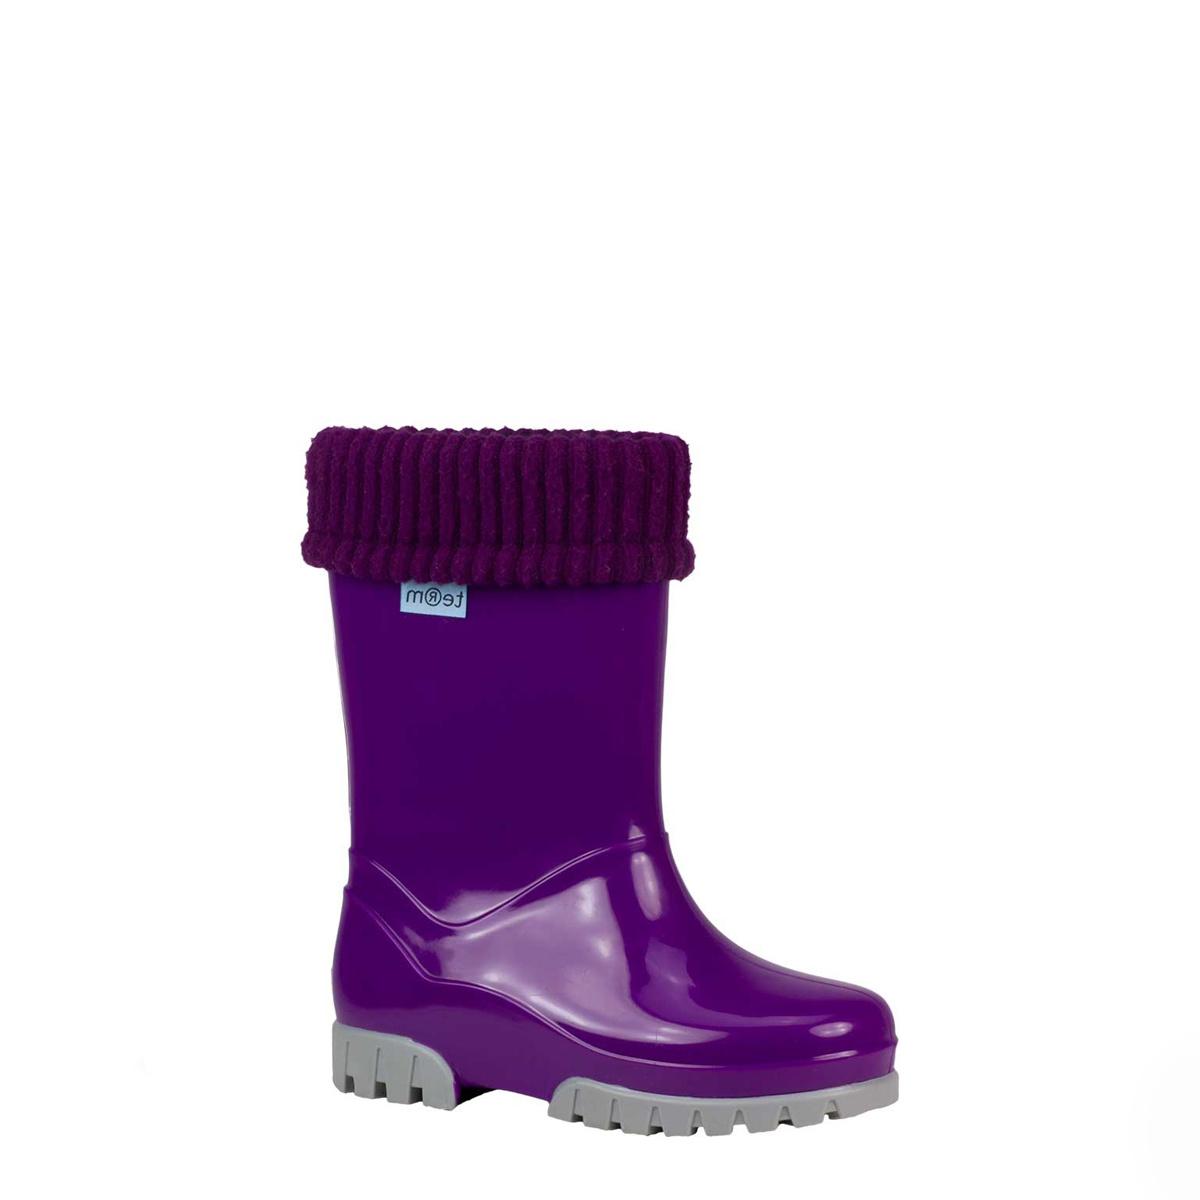 Term Girls Purple Wellies